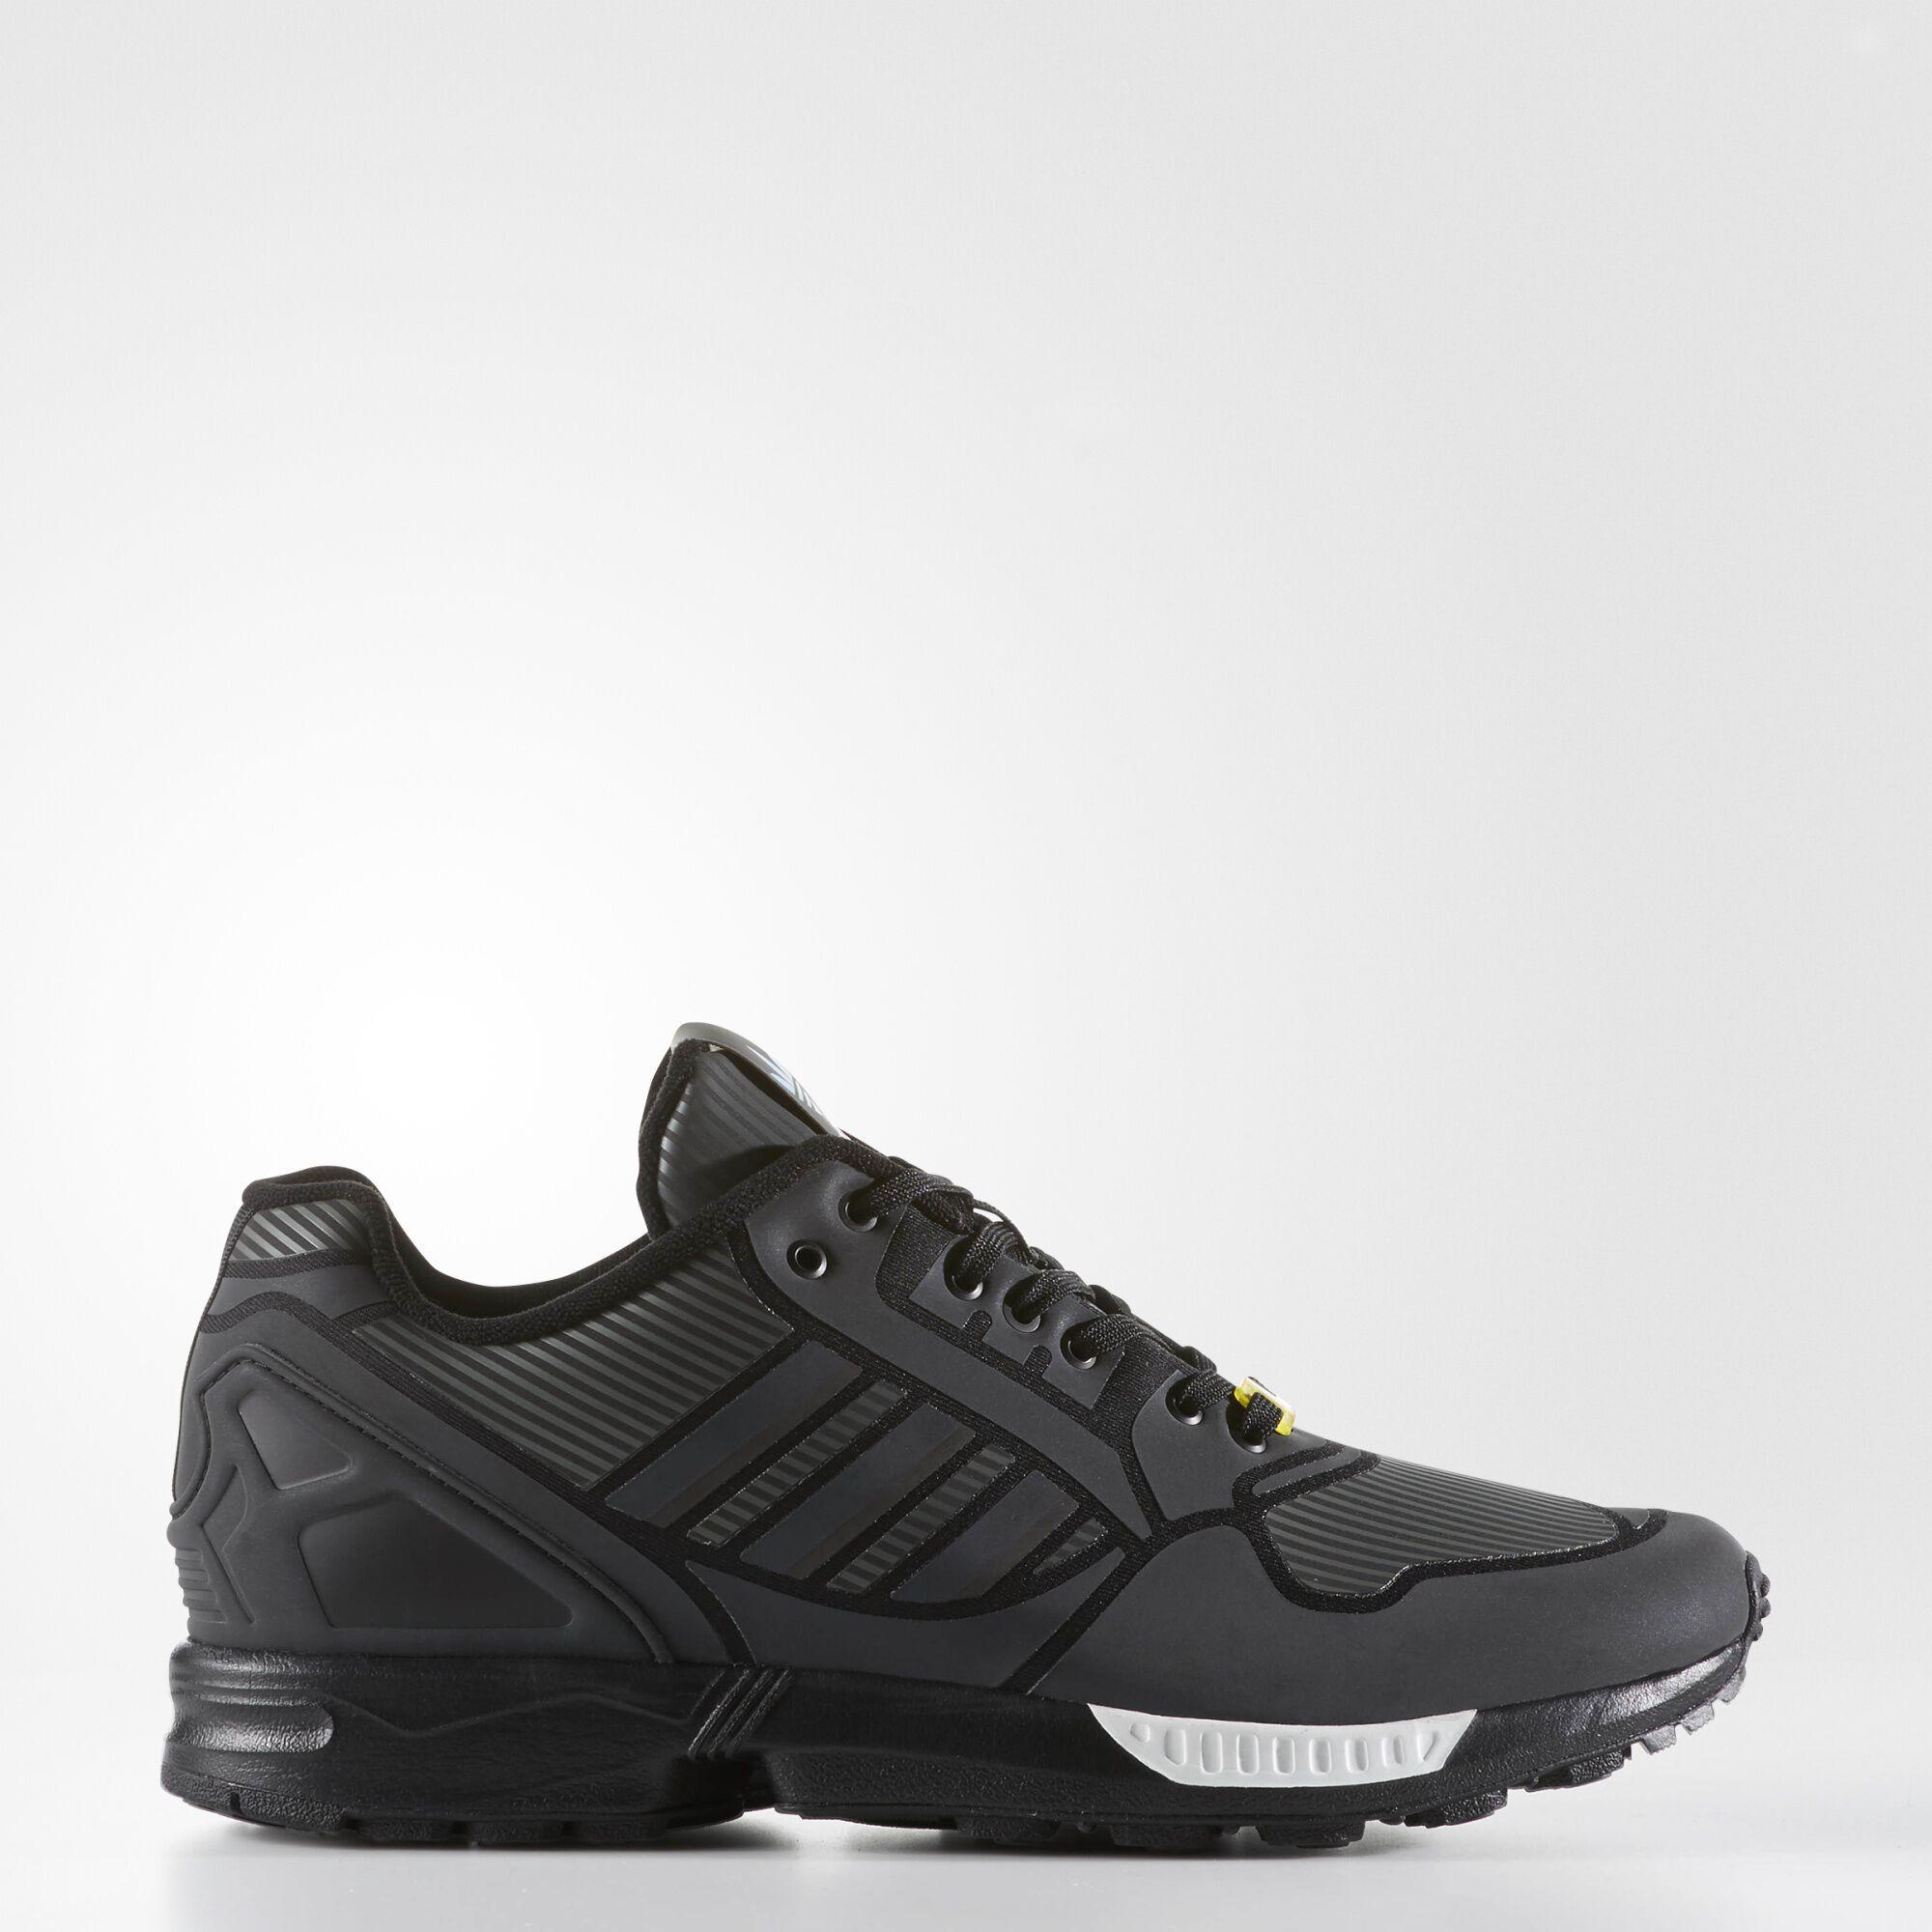 adidas original zx flux plus Averta